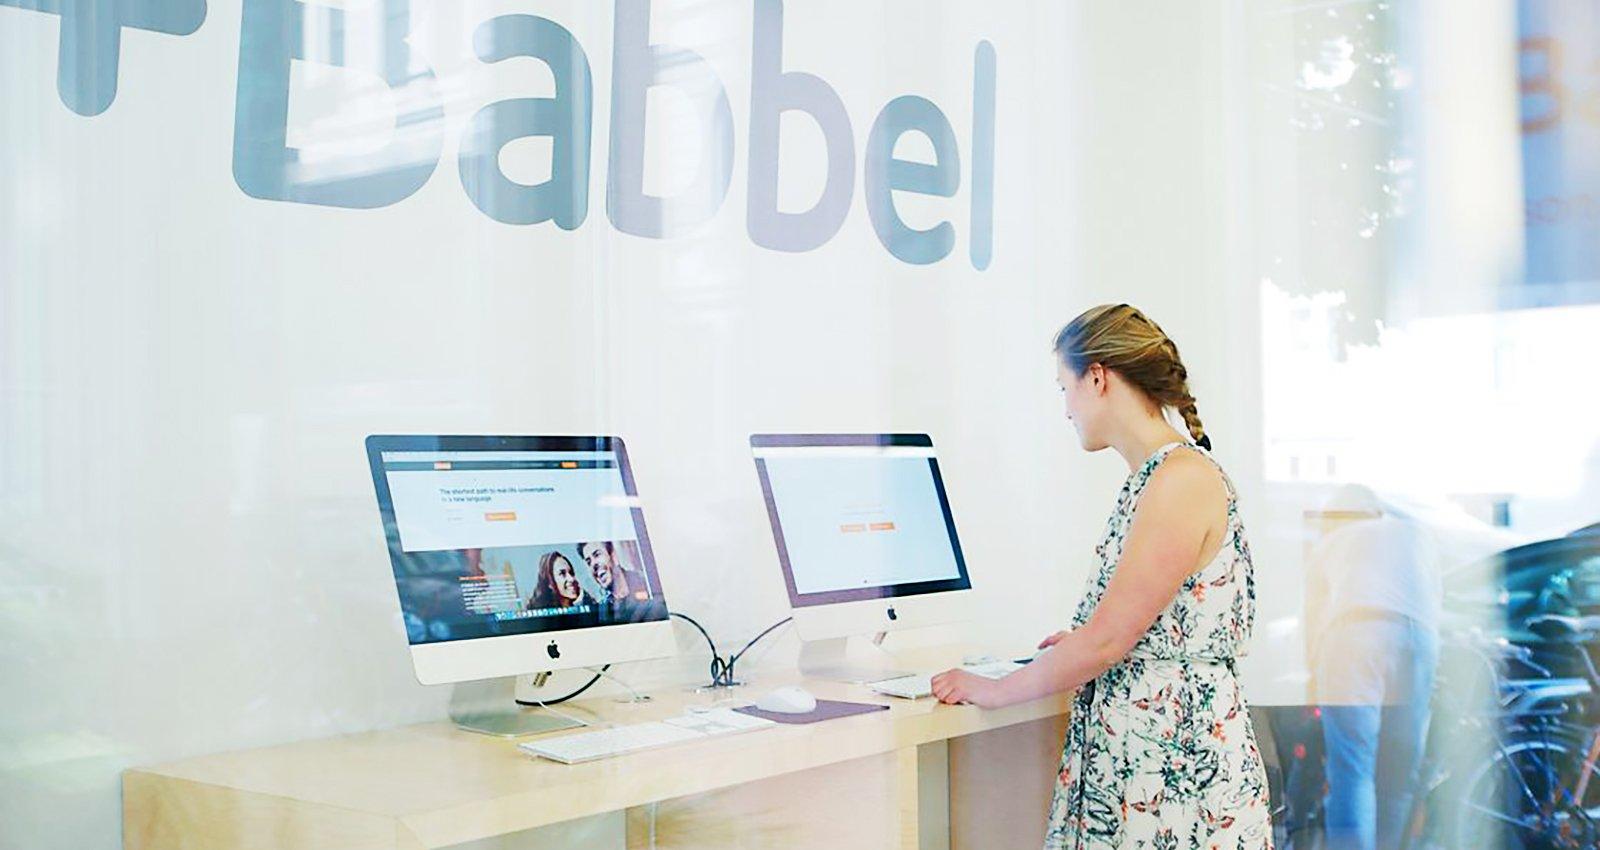 Sprachlern-App Babbel plant Börsengang